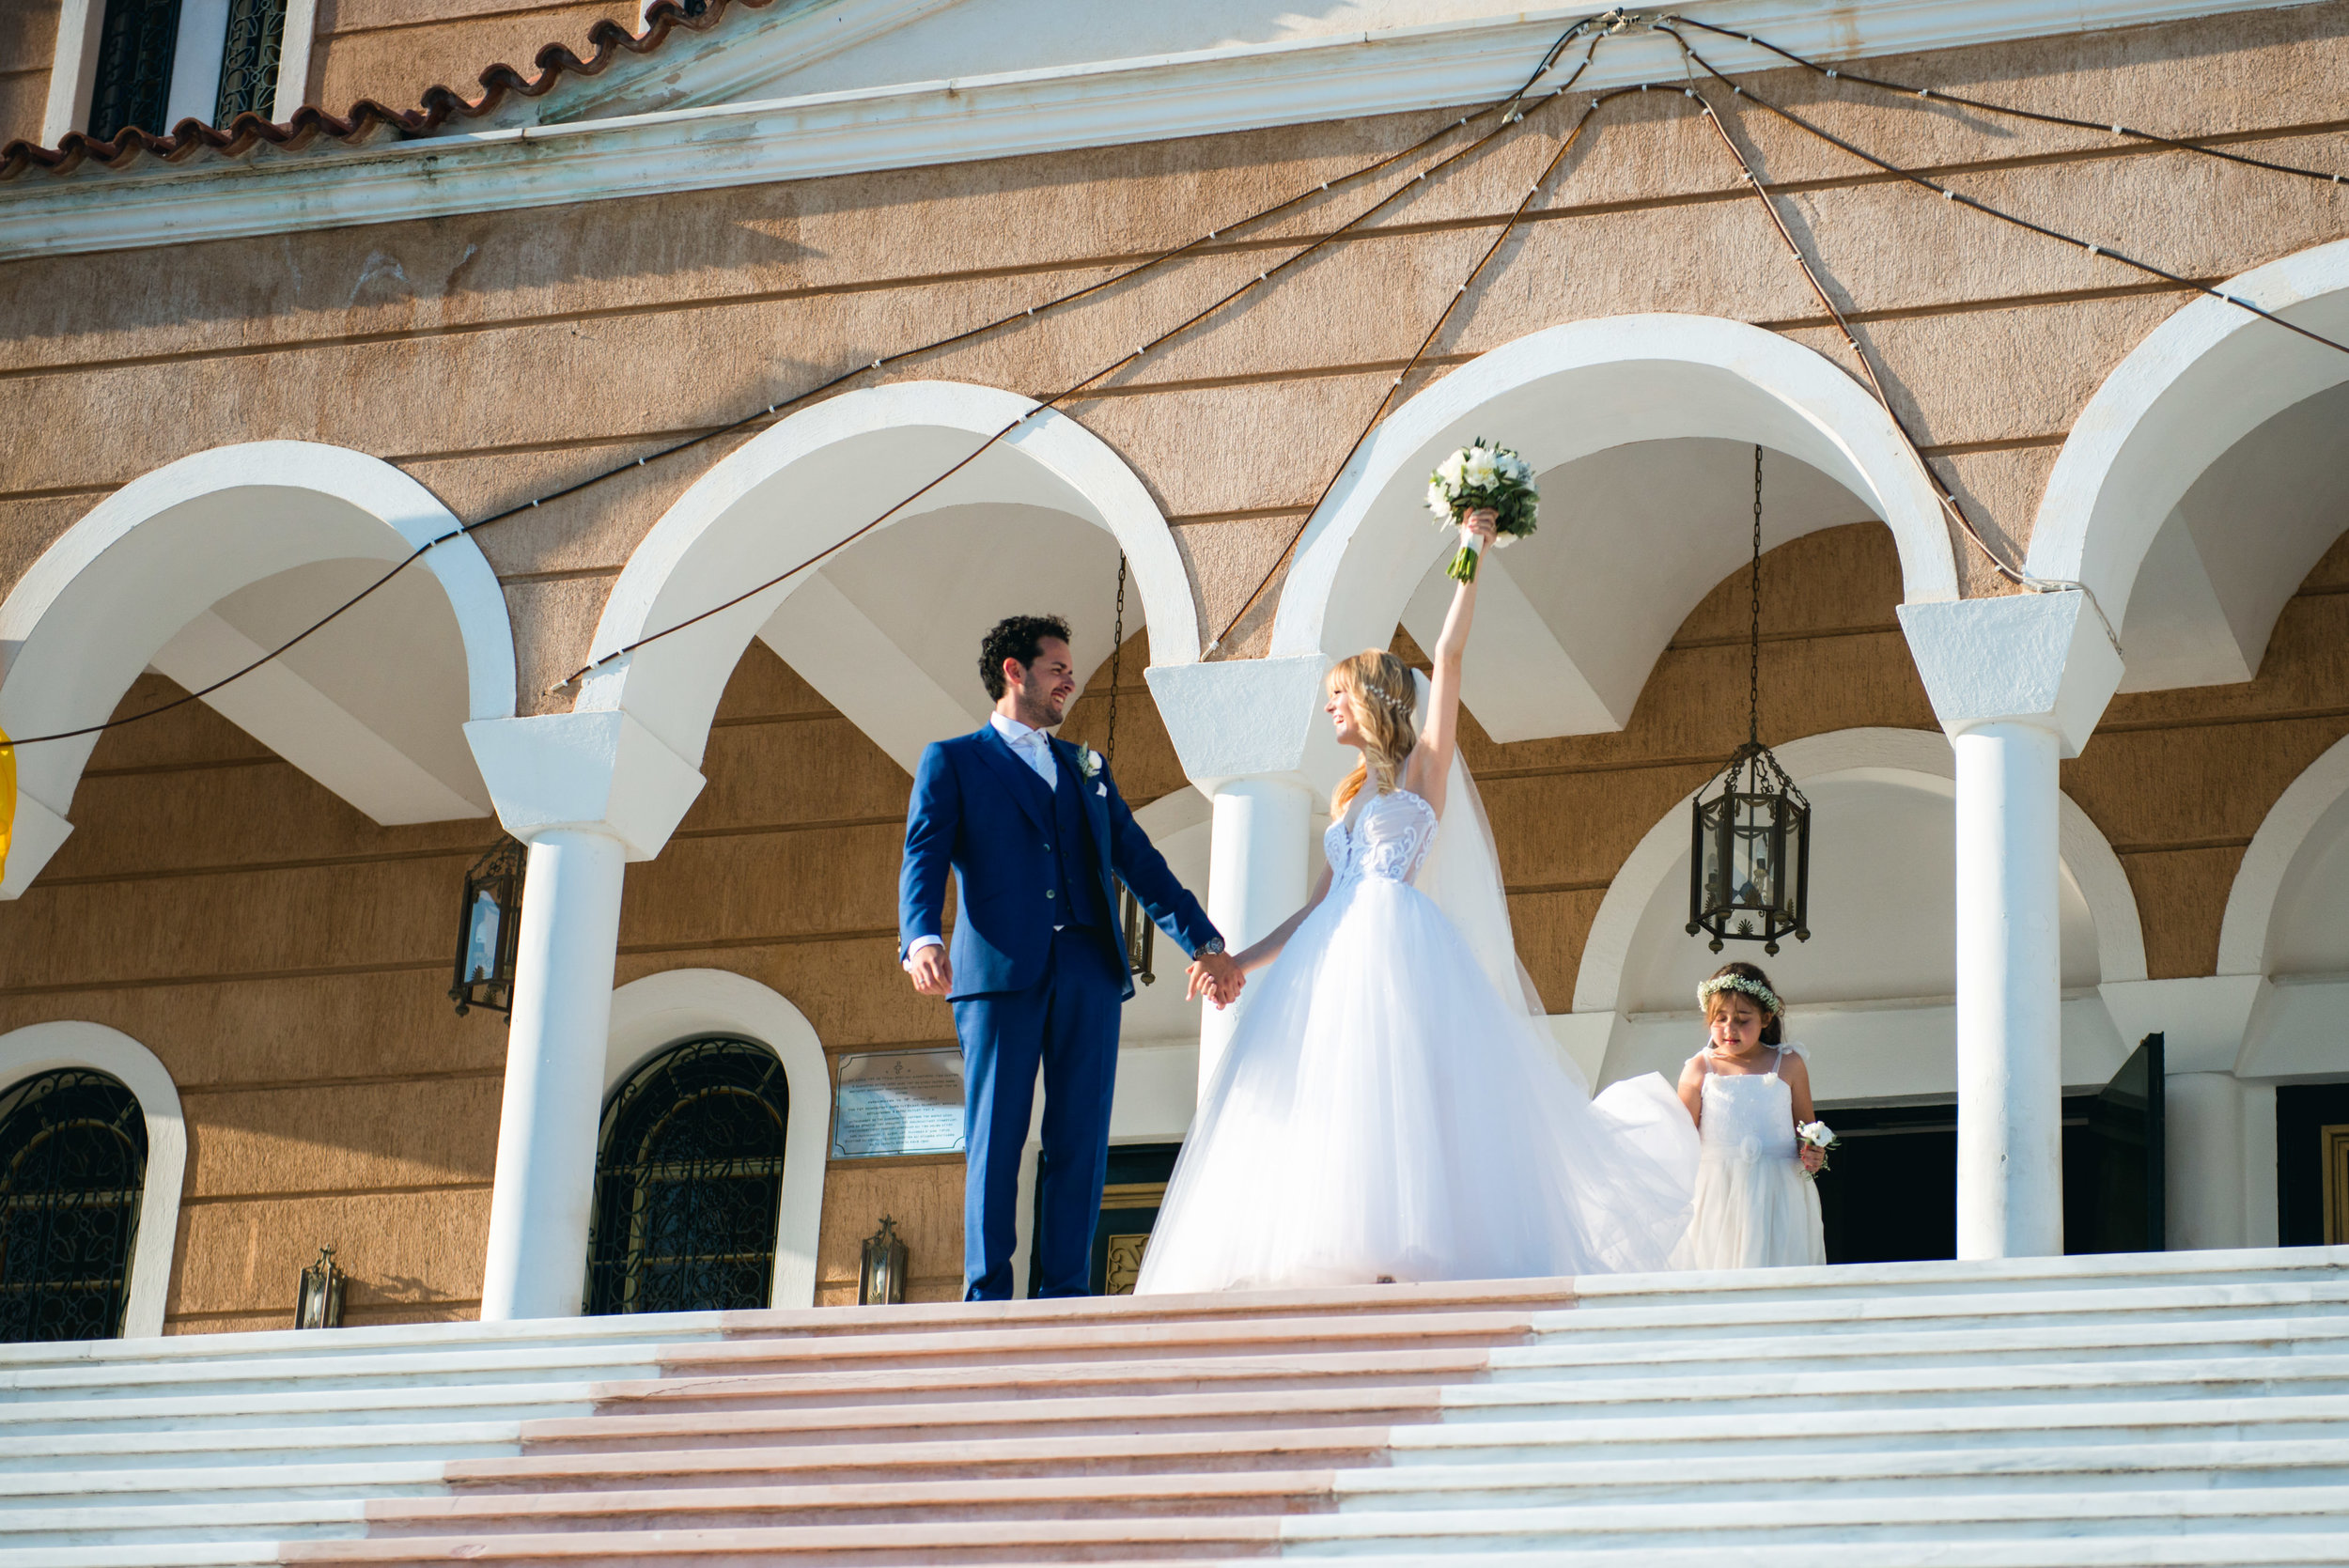 Wedtime_Stories_-_Nikolaos__Stefanie_-_Ceremony-215.jpg